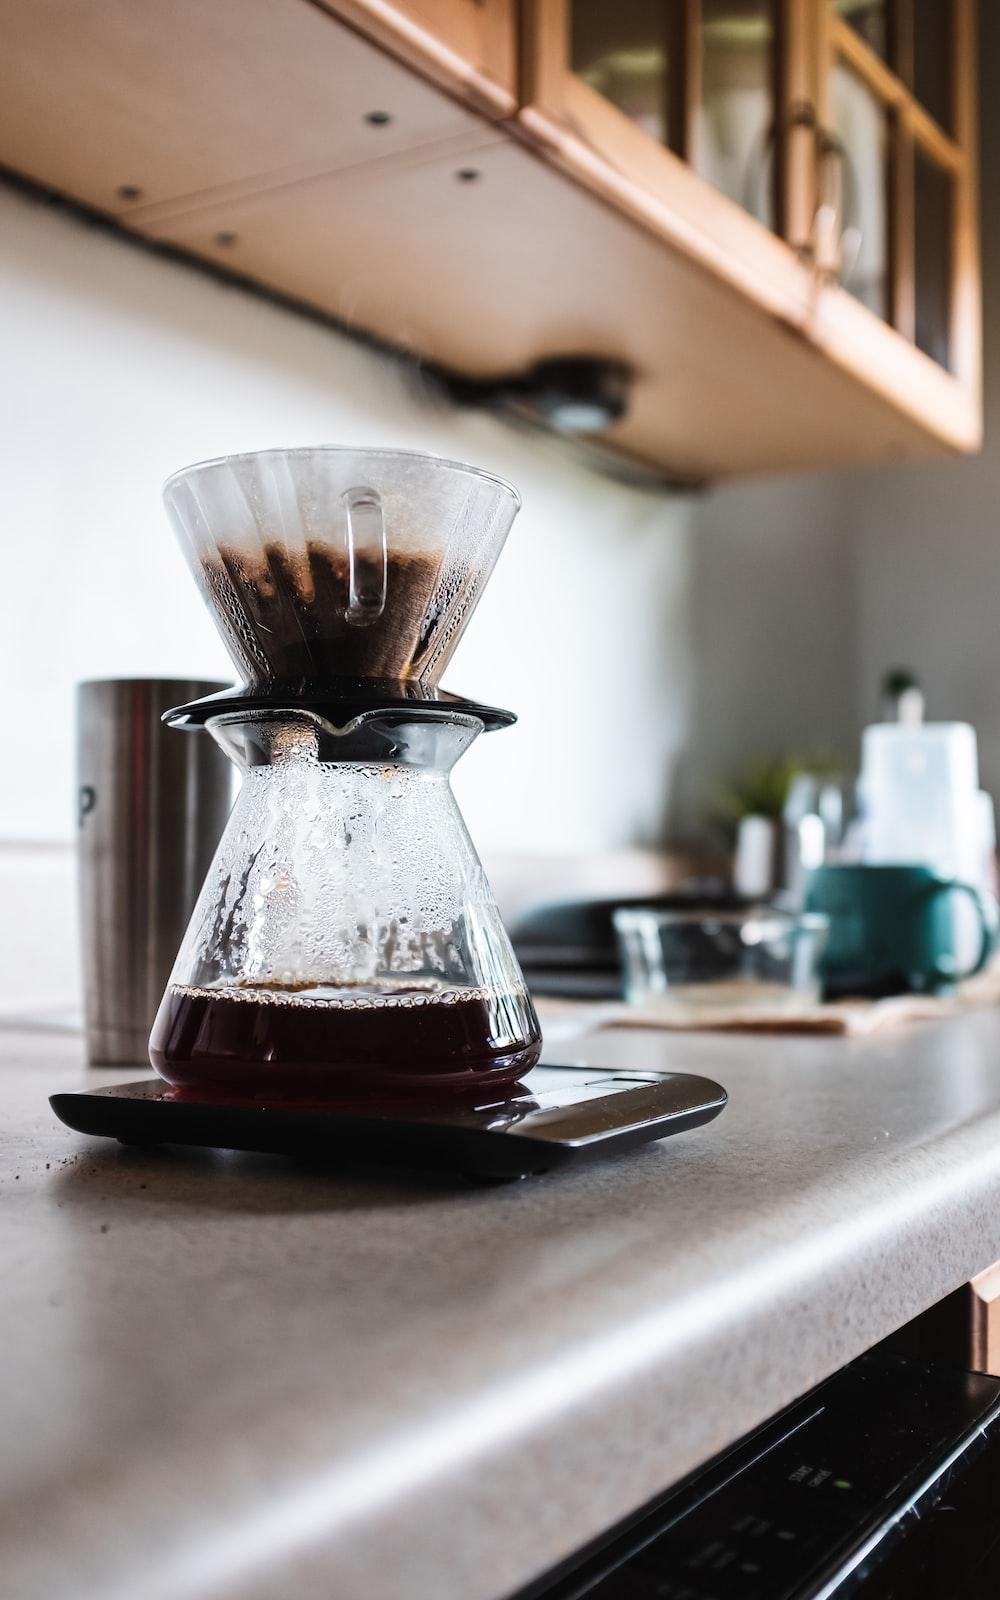 coffee being brewed in coffeemaker